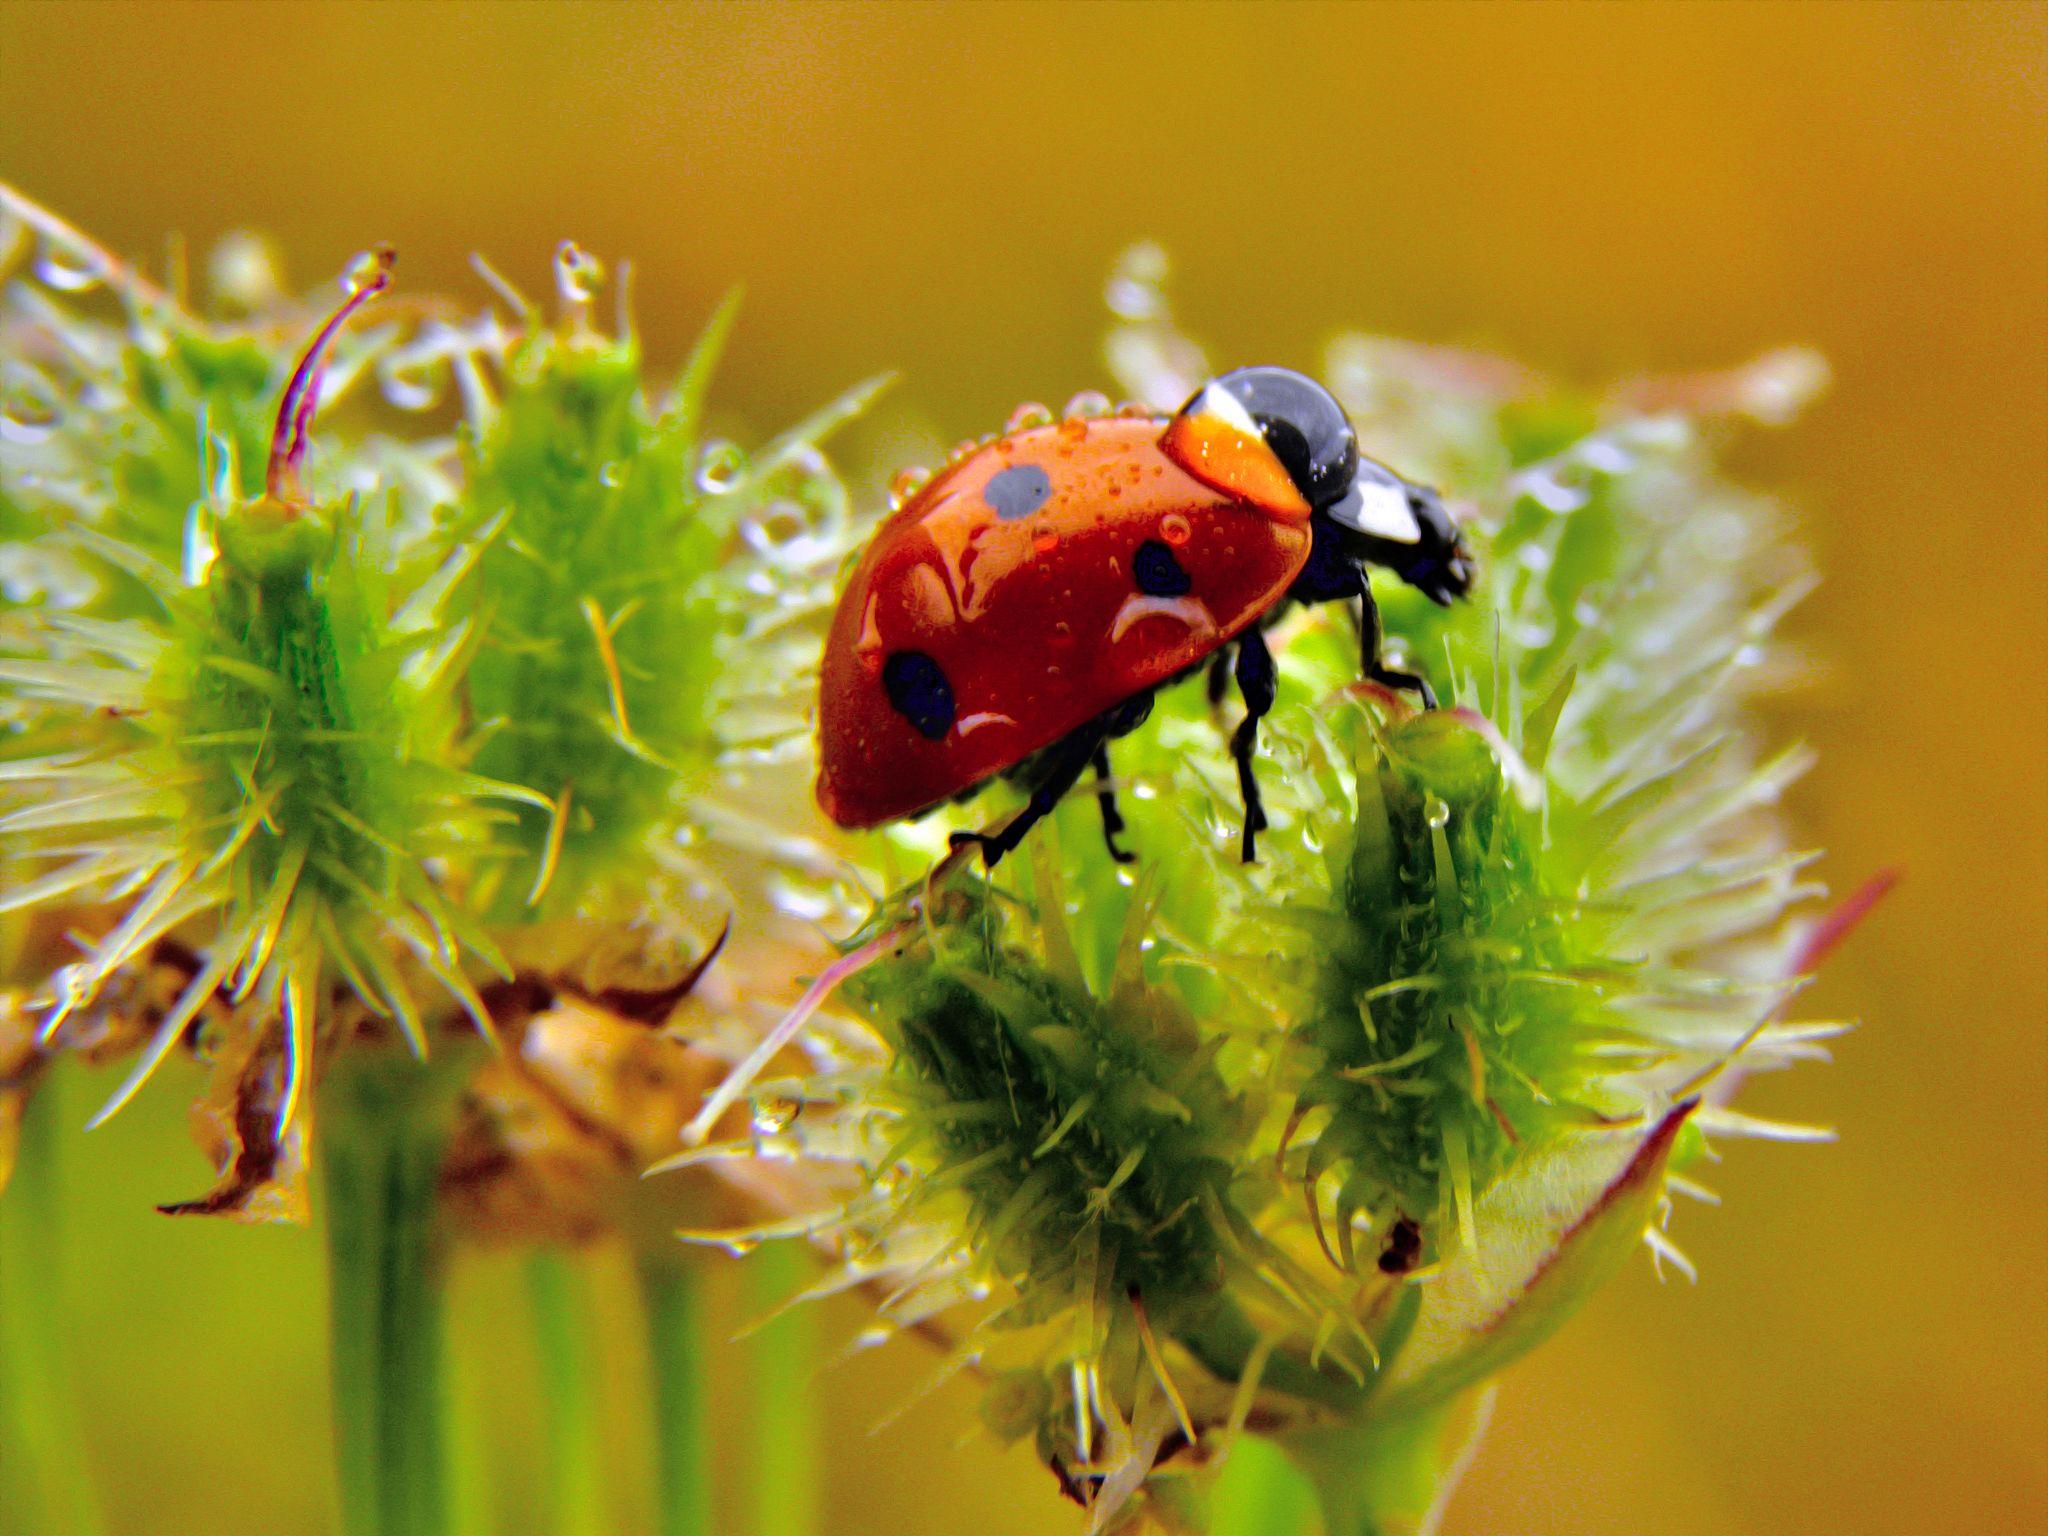 Ladybug by Slavko Marcac